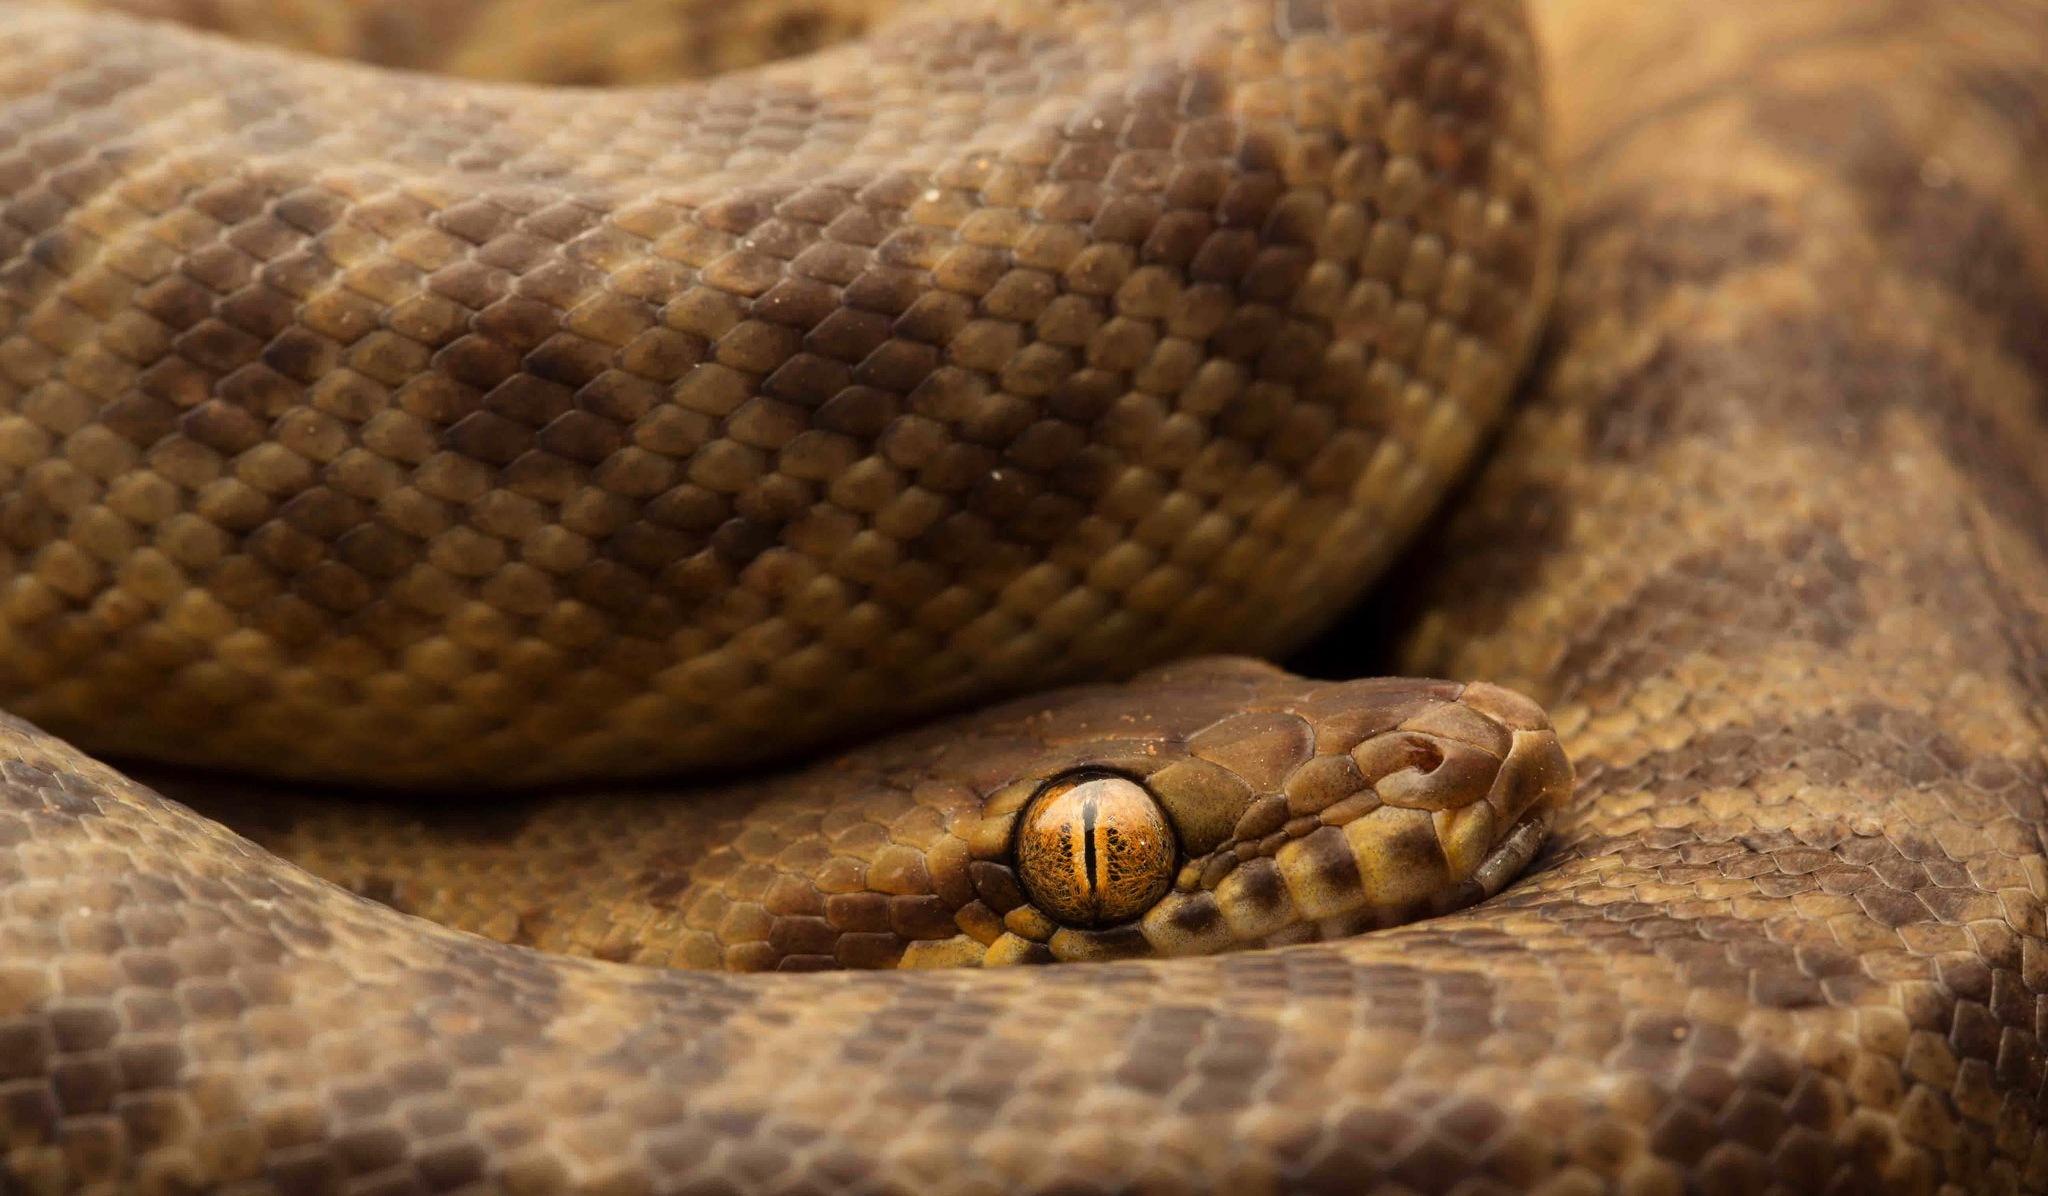 картинки на обои гремучей змеи так